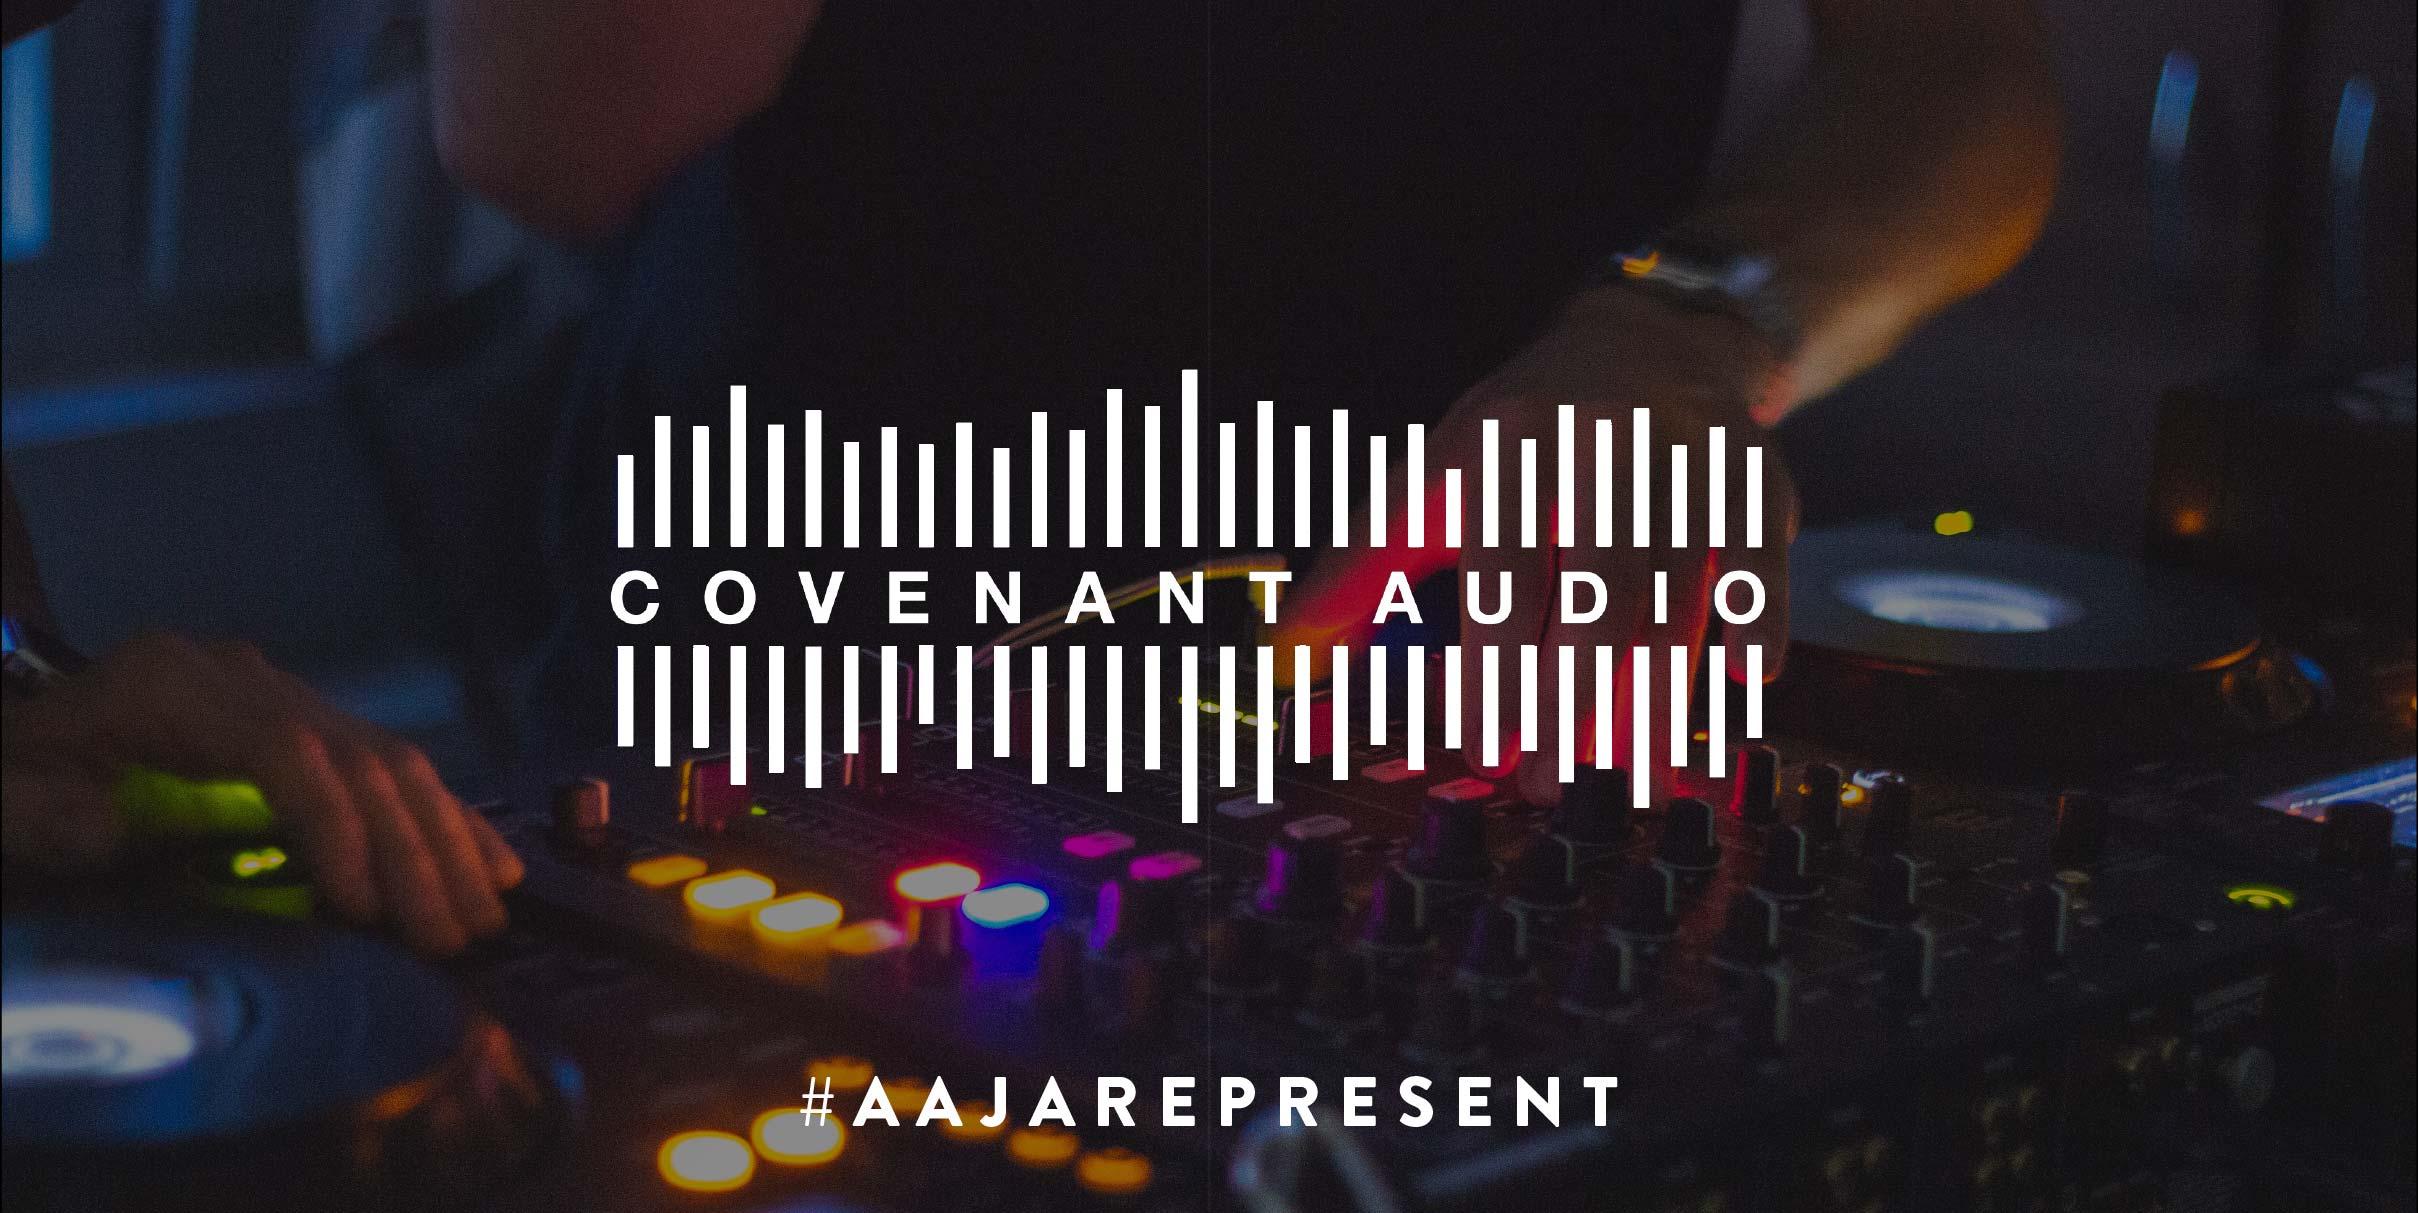 AAJARepresent Entertainment: Covenant Audio